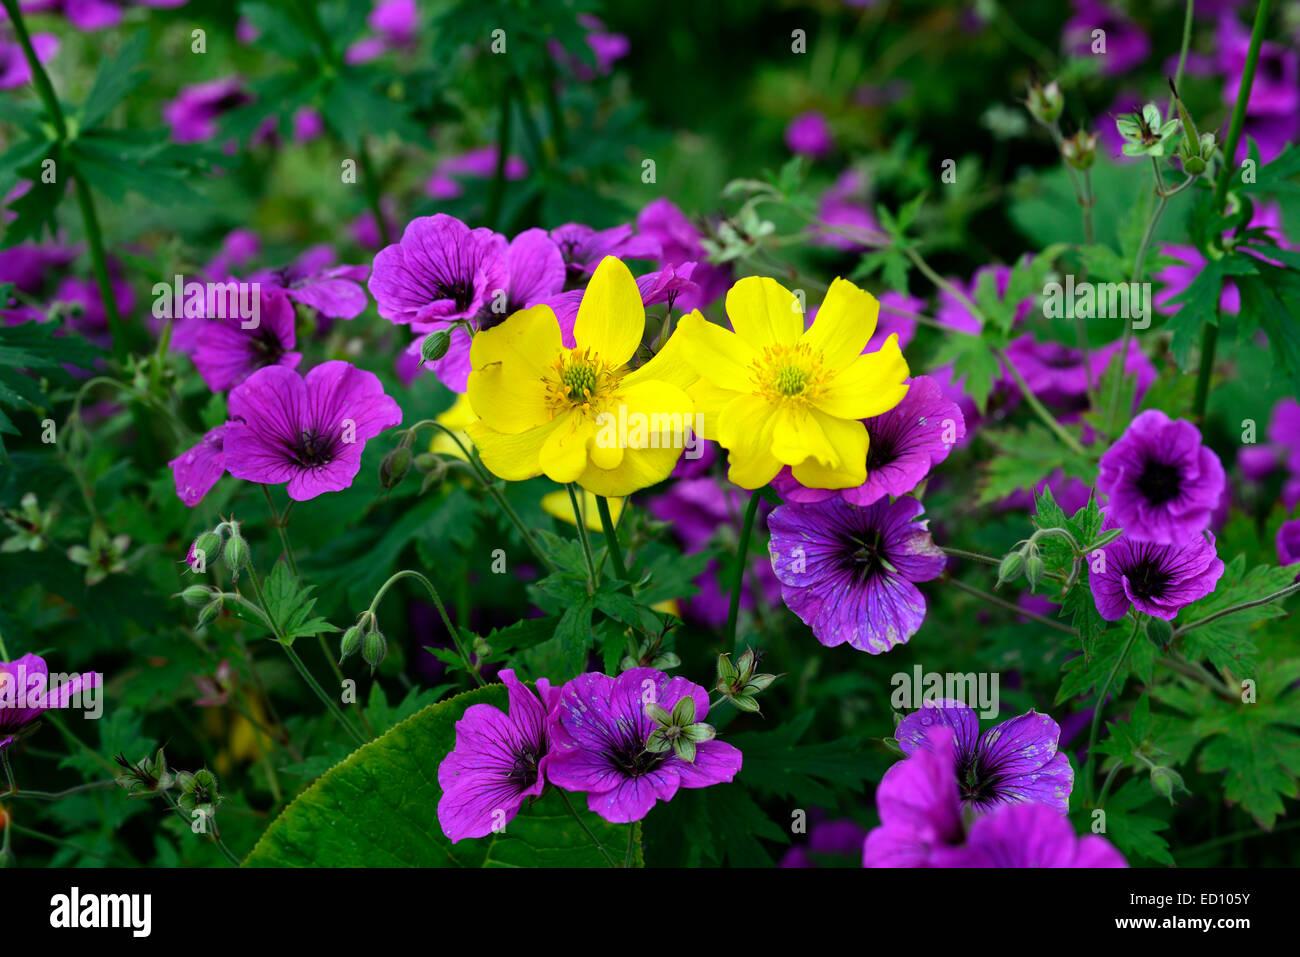 Meconopsis Cambrica Geranium Psilostemon Yellow Purple Flower